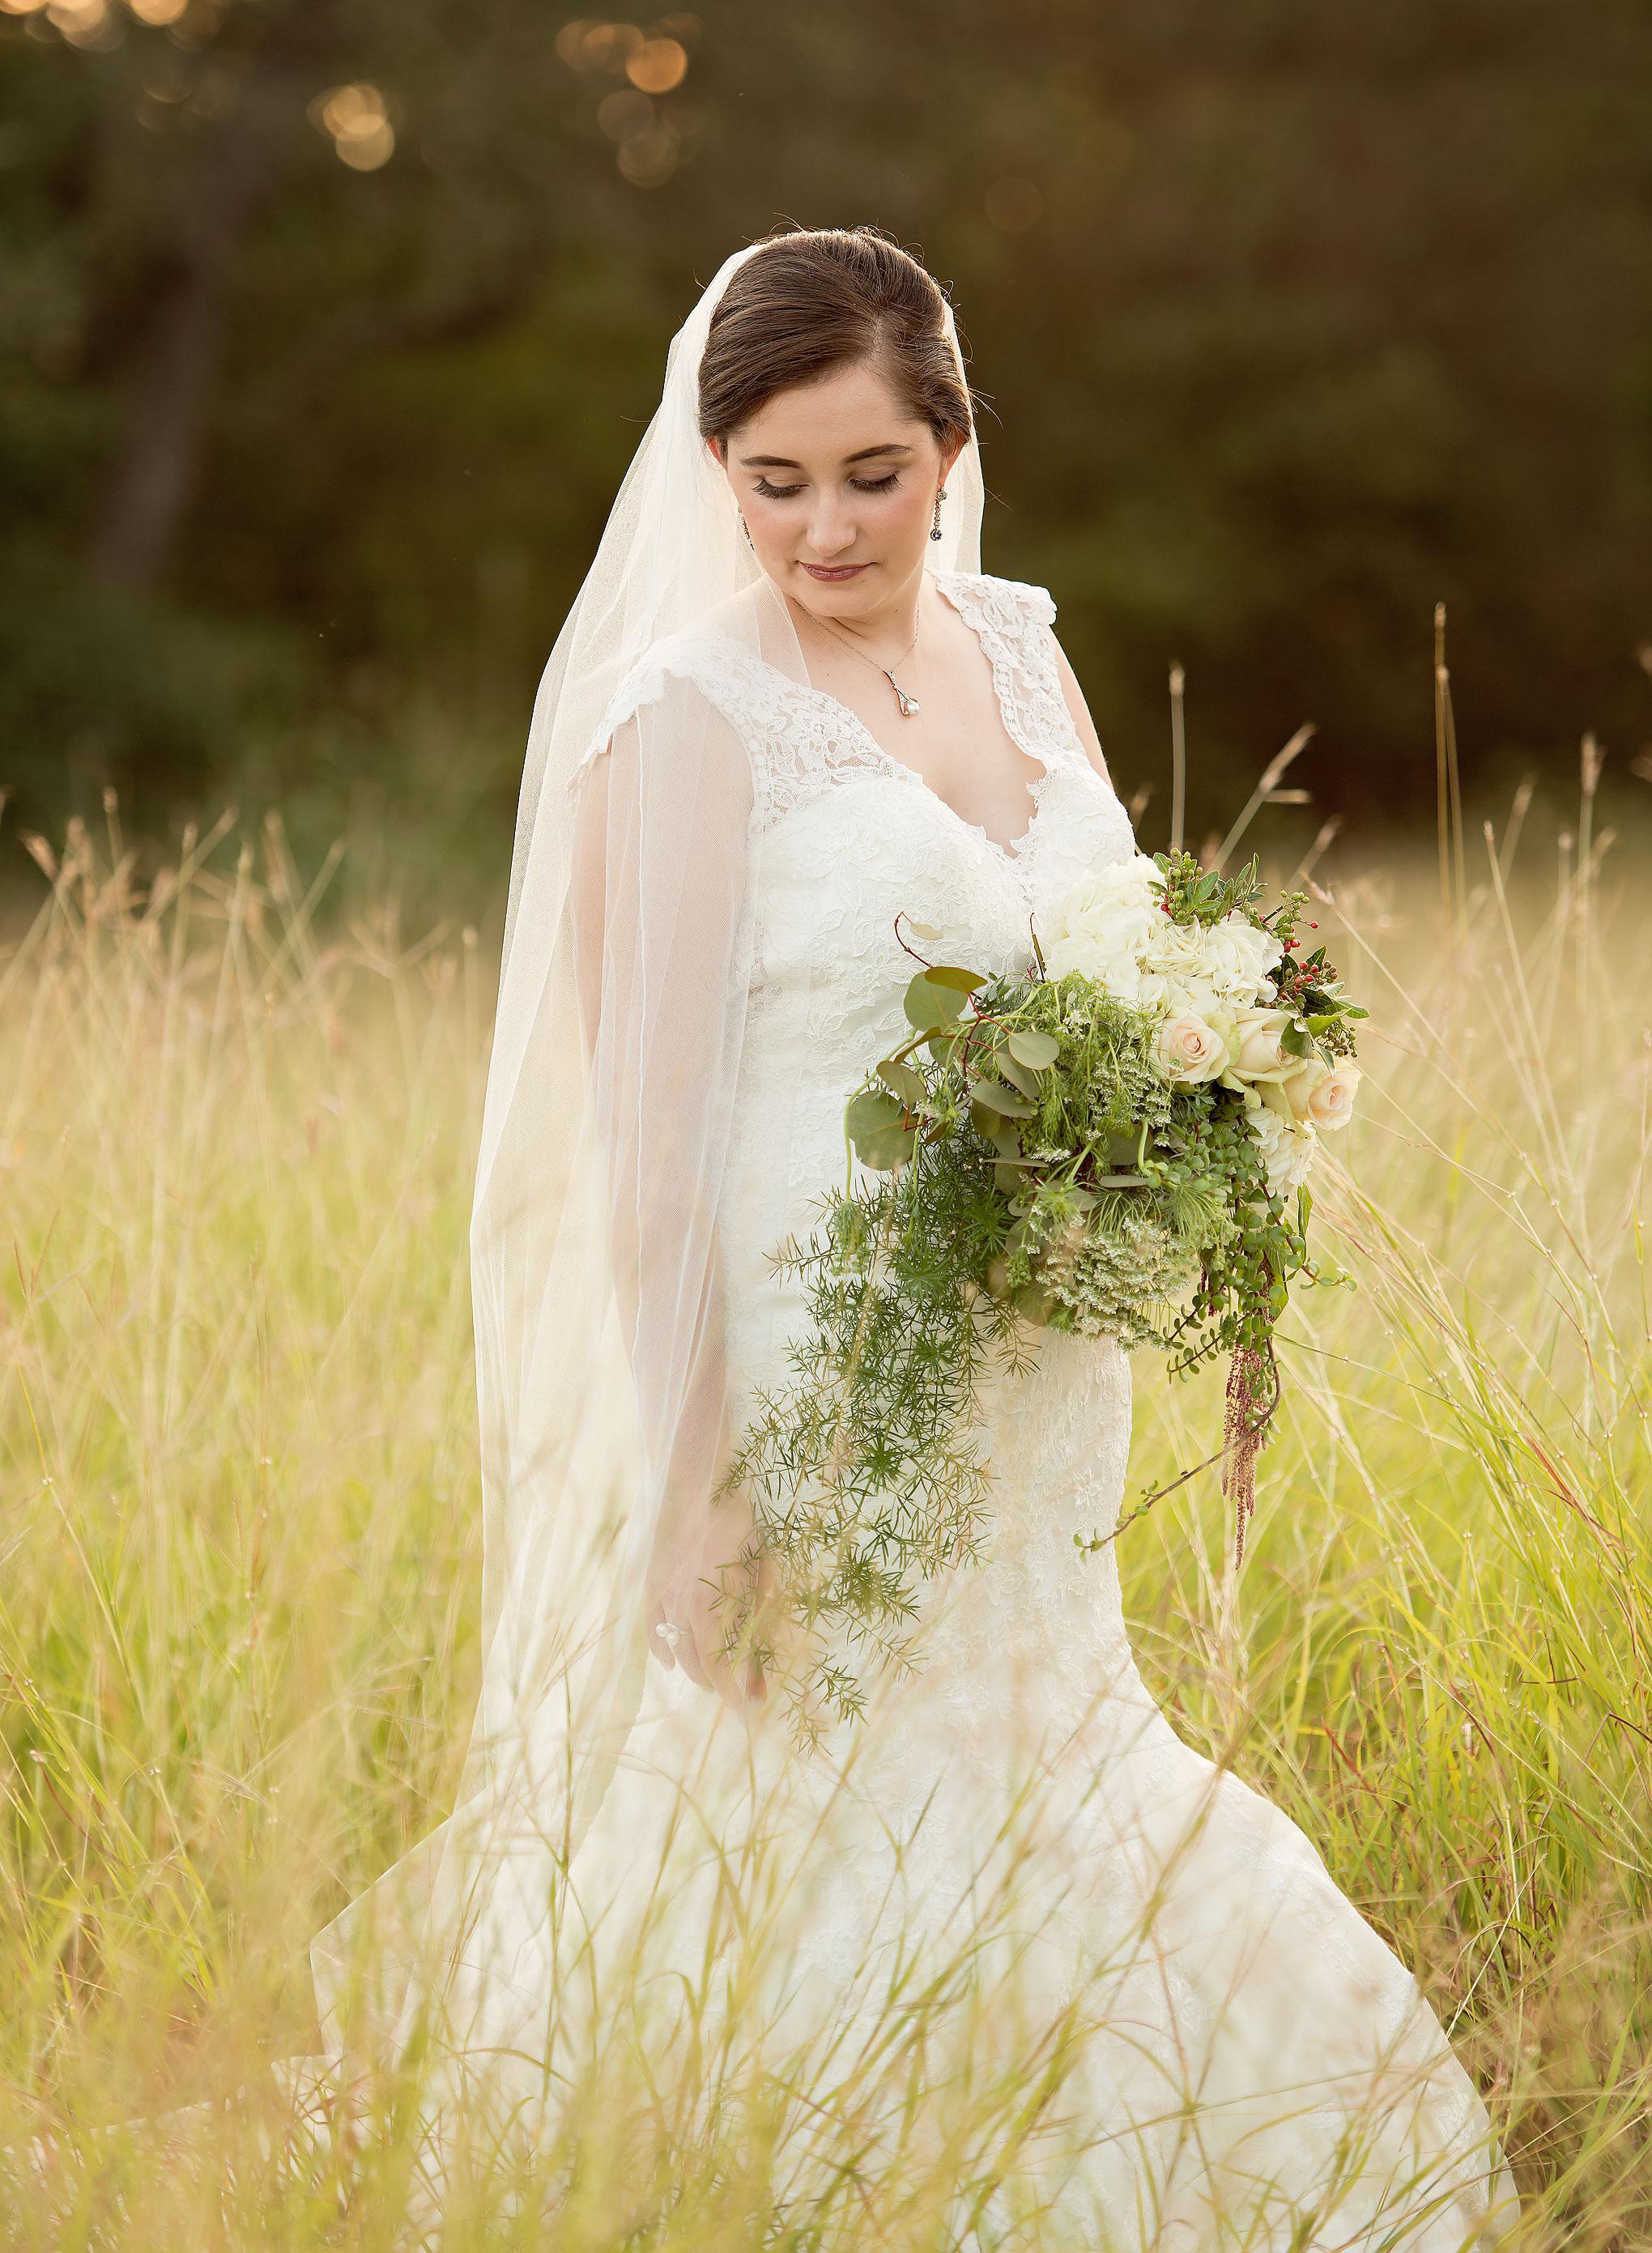 Wedding_photography_san_antonio_texas_bloom_NMM_6223.jpg